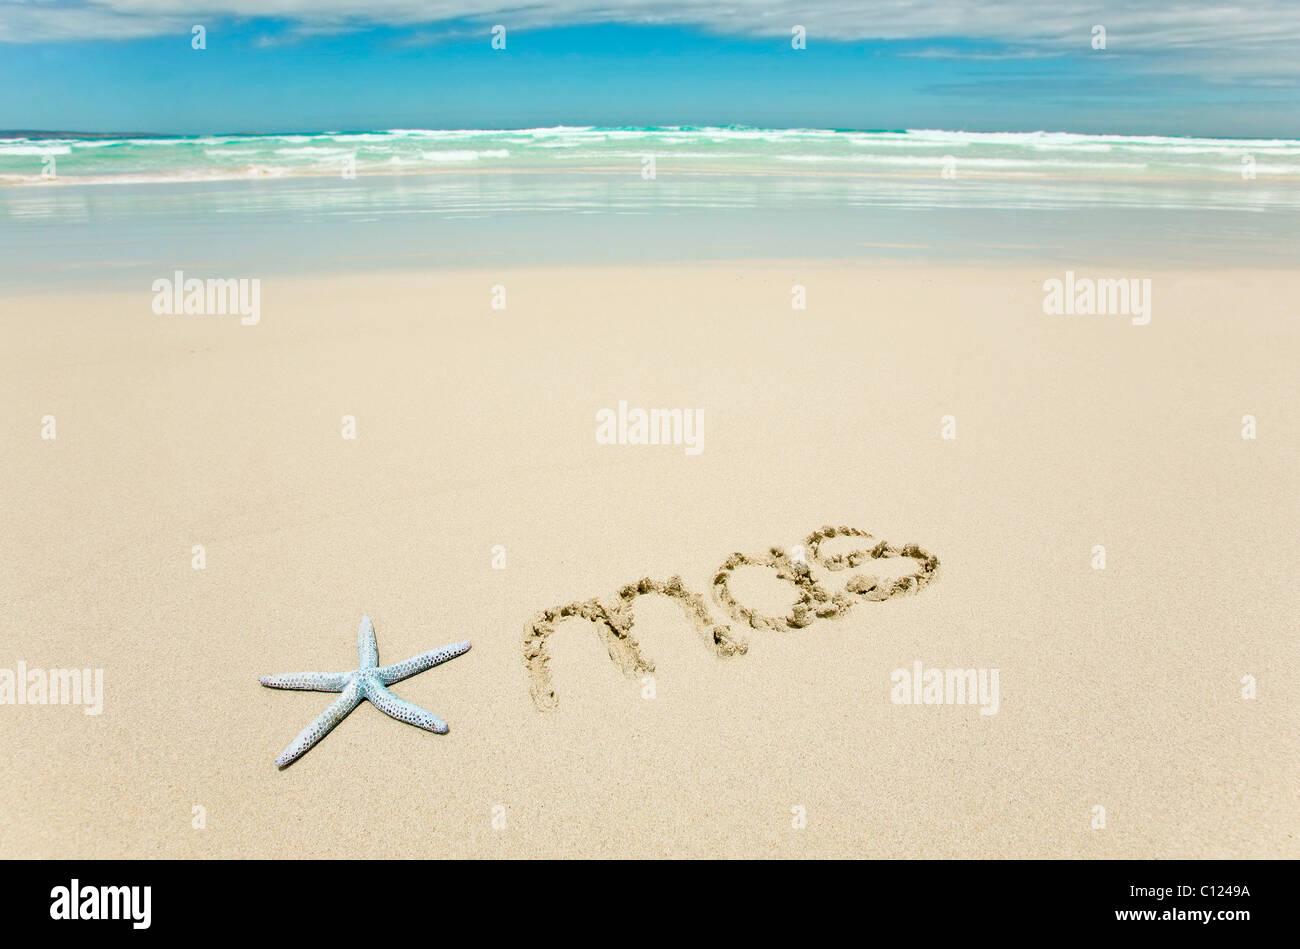 Xmas written on beach - Stock Image